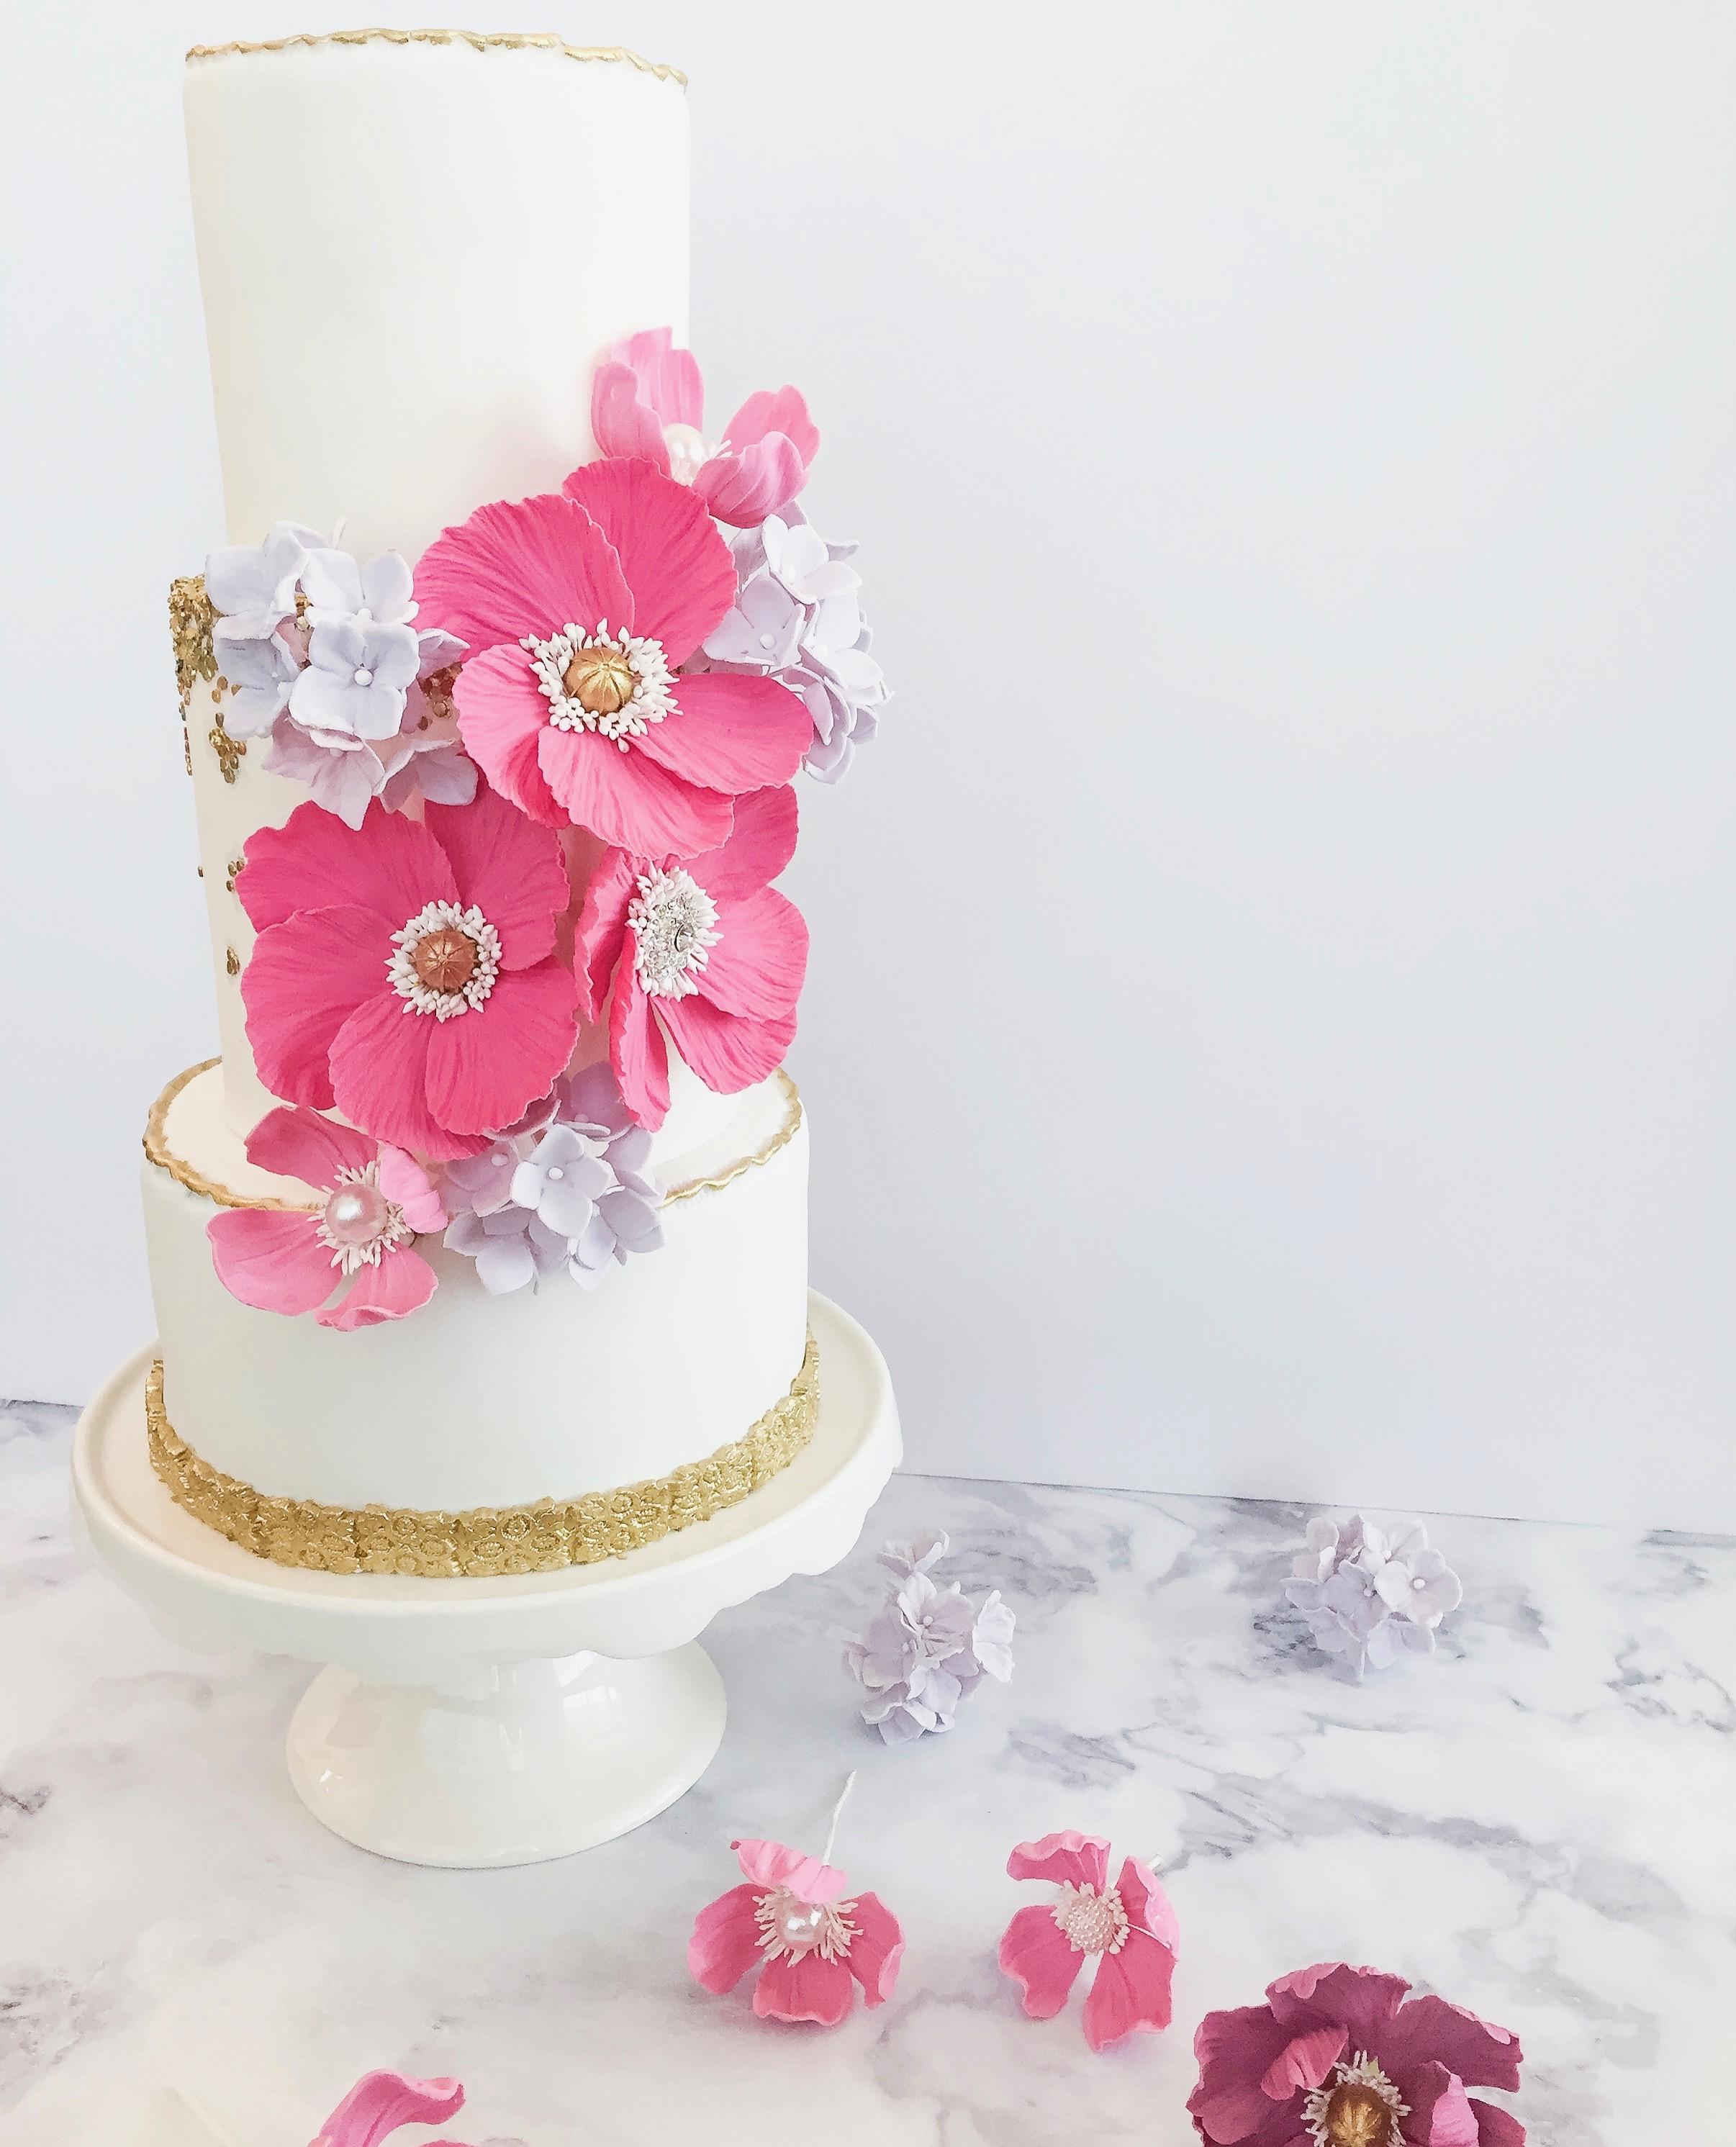 White wedding cake with bright pink sugar flowers